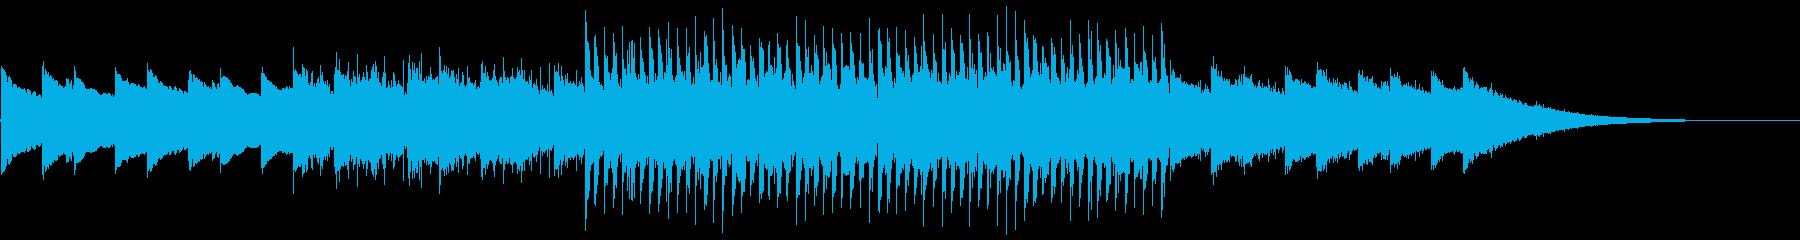 R&B スタイリッシュ くつろぐ ...の再生済みの波形